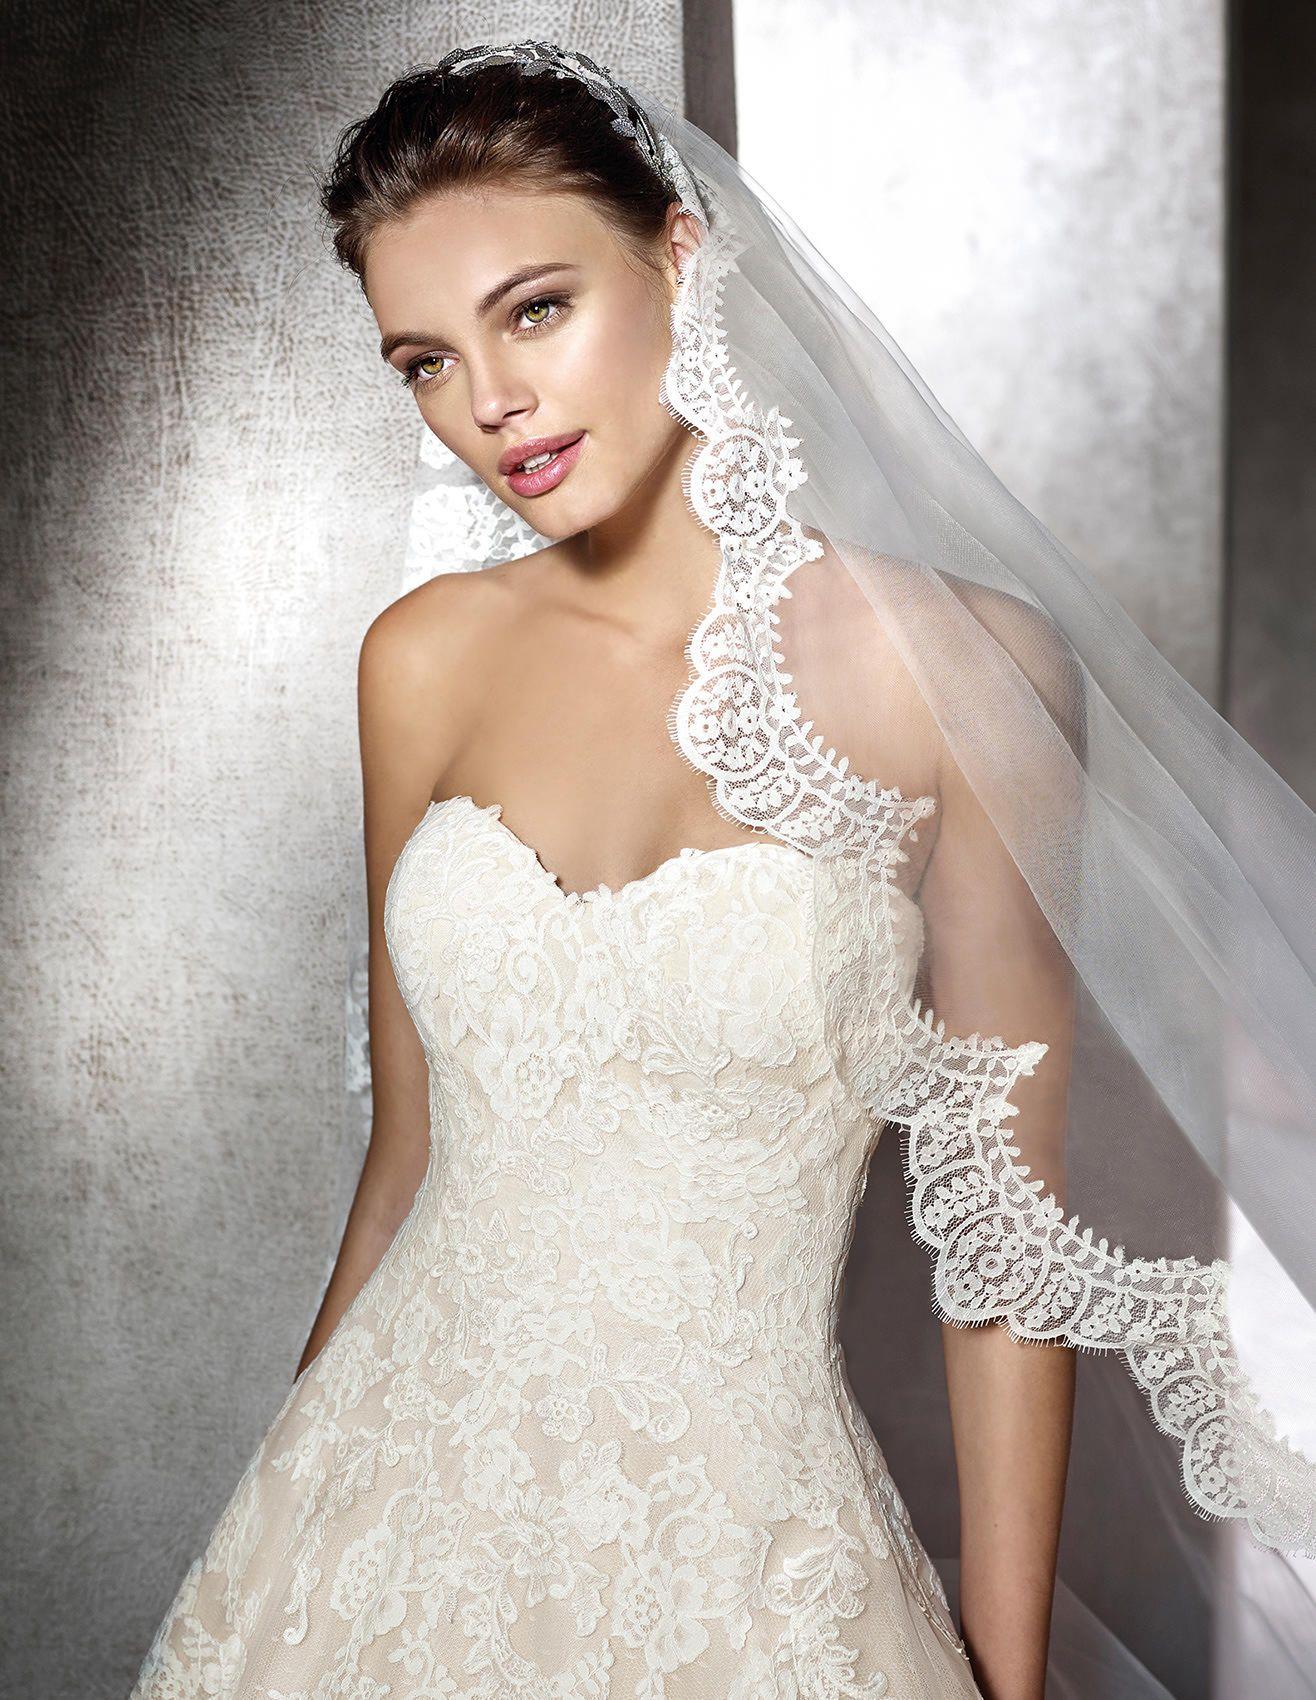 ZURANA - Princess wedding dress, in lace | St. Patrick